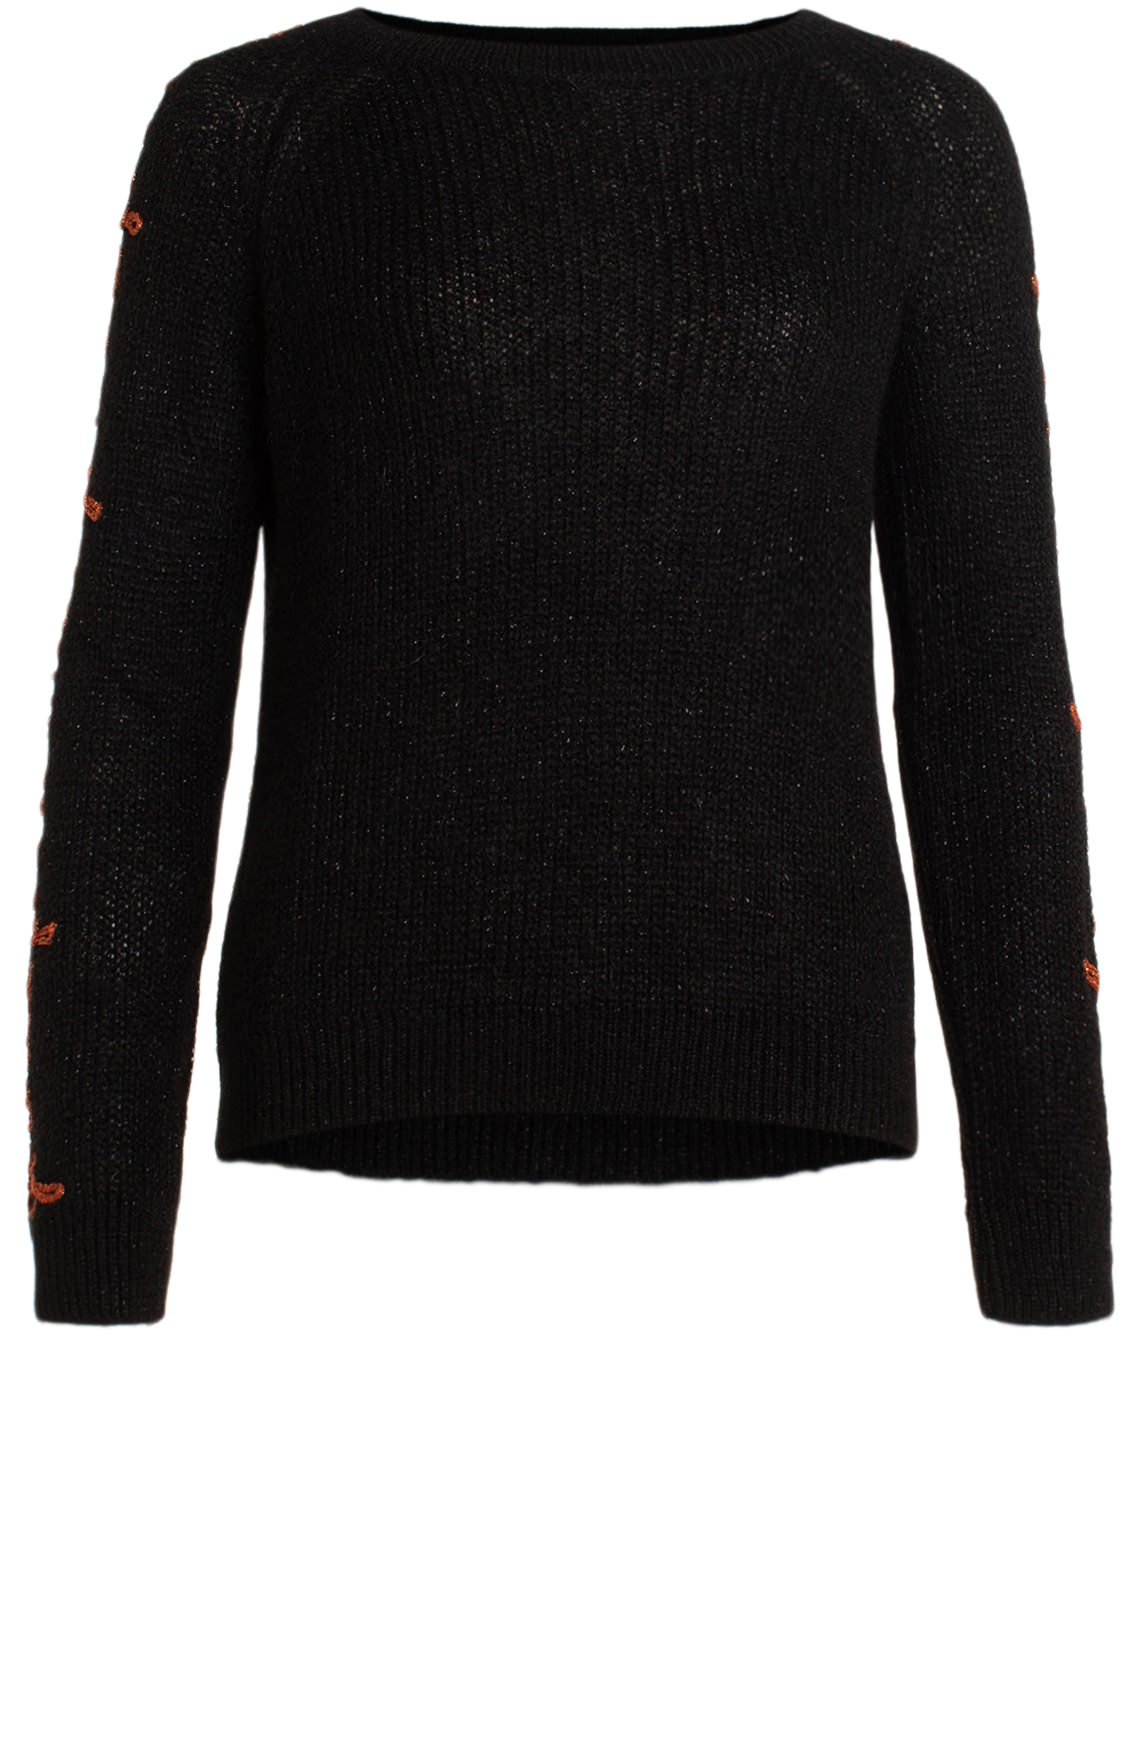 Kocca Dames Majorca pullover zwart